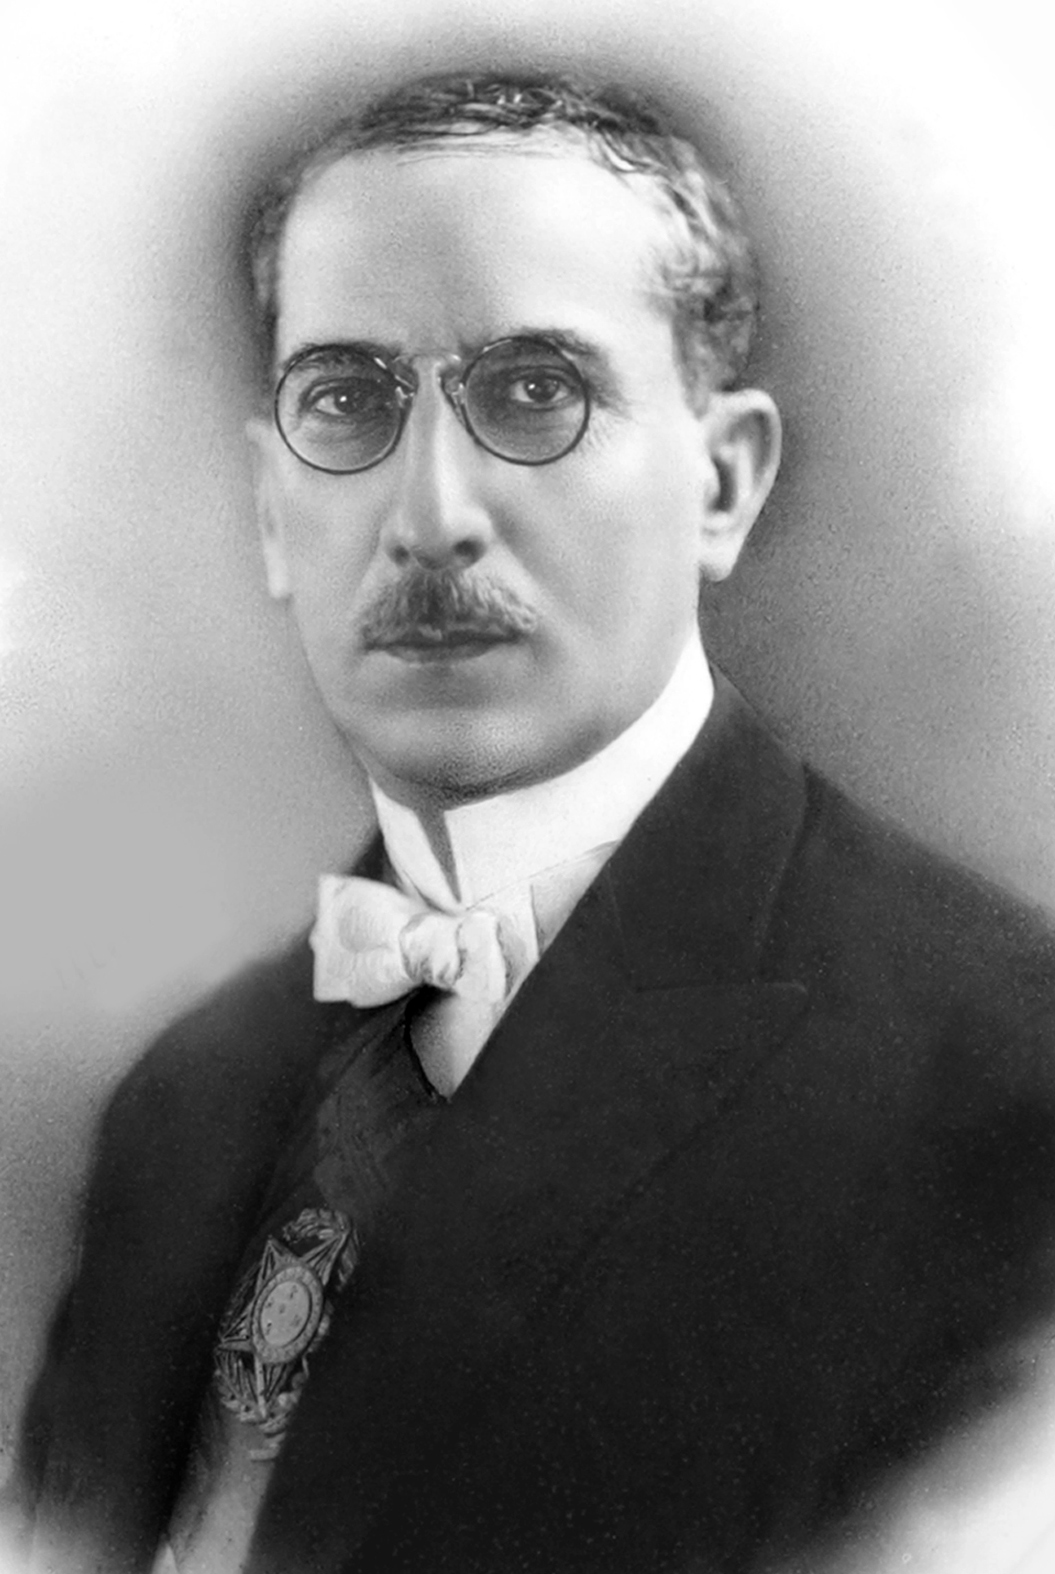 Depiction of Artur Bernardes